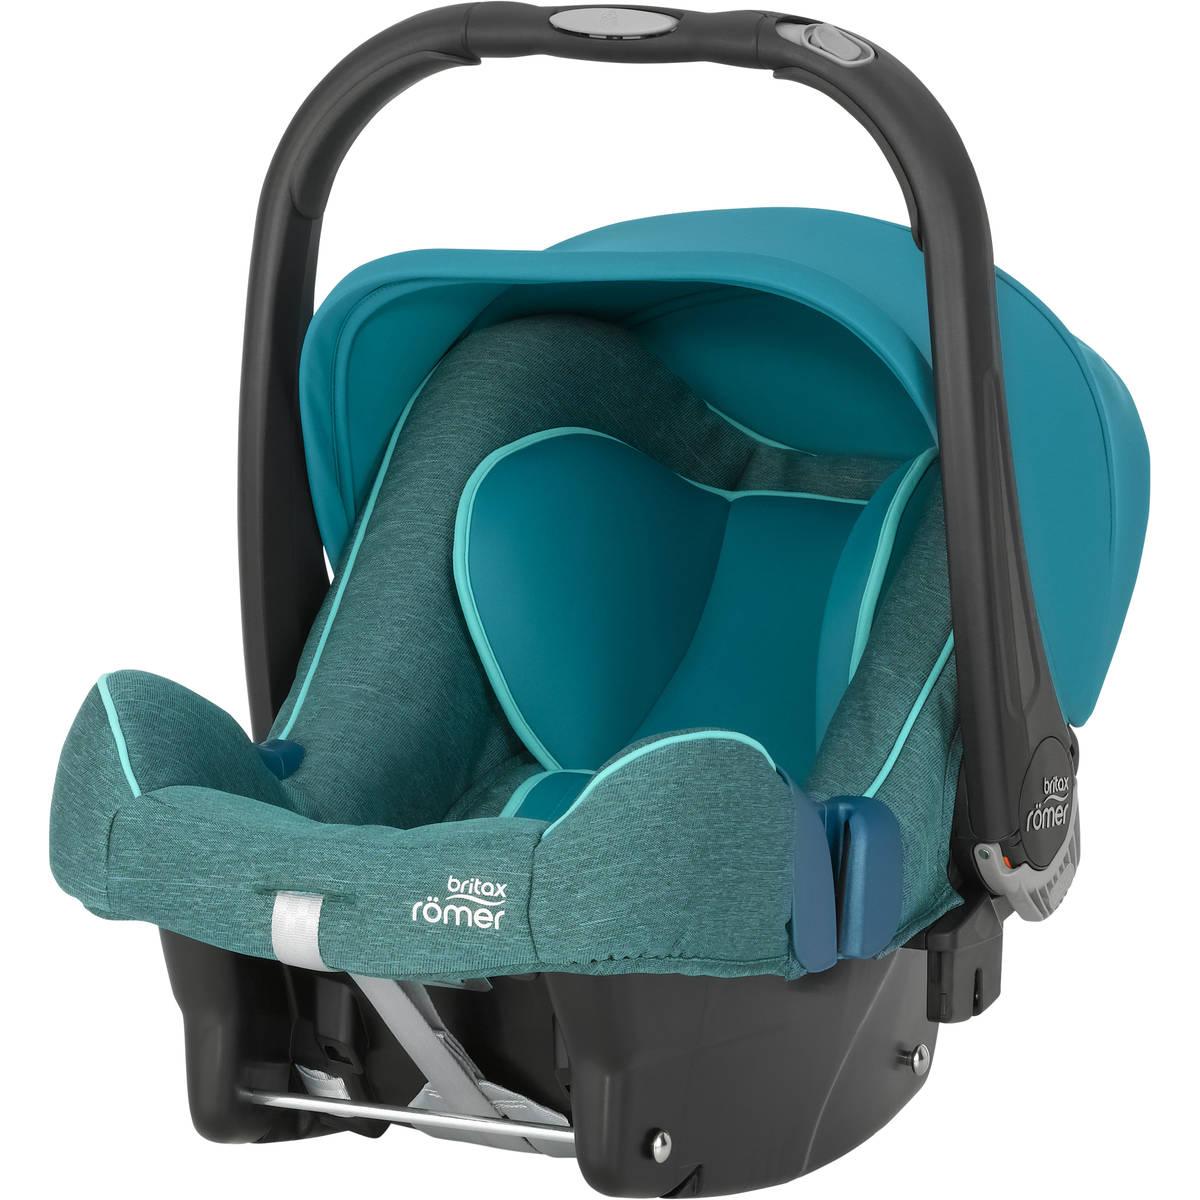 turvakaukalo britax baby safe shr ii. Black Bedroom Furniture Sets. Home Design Ideas